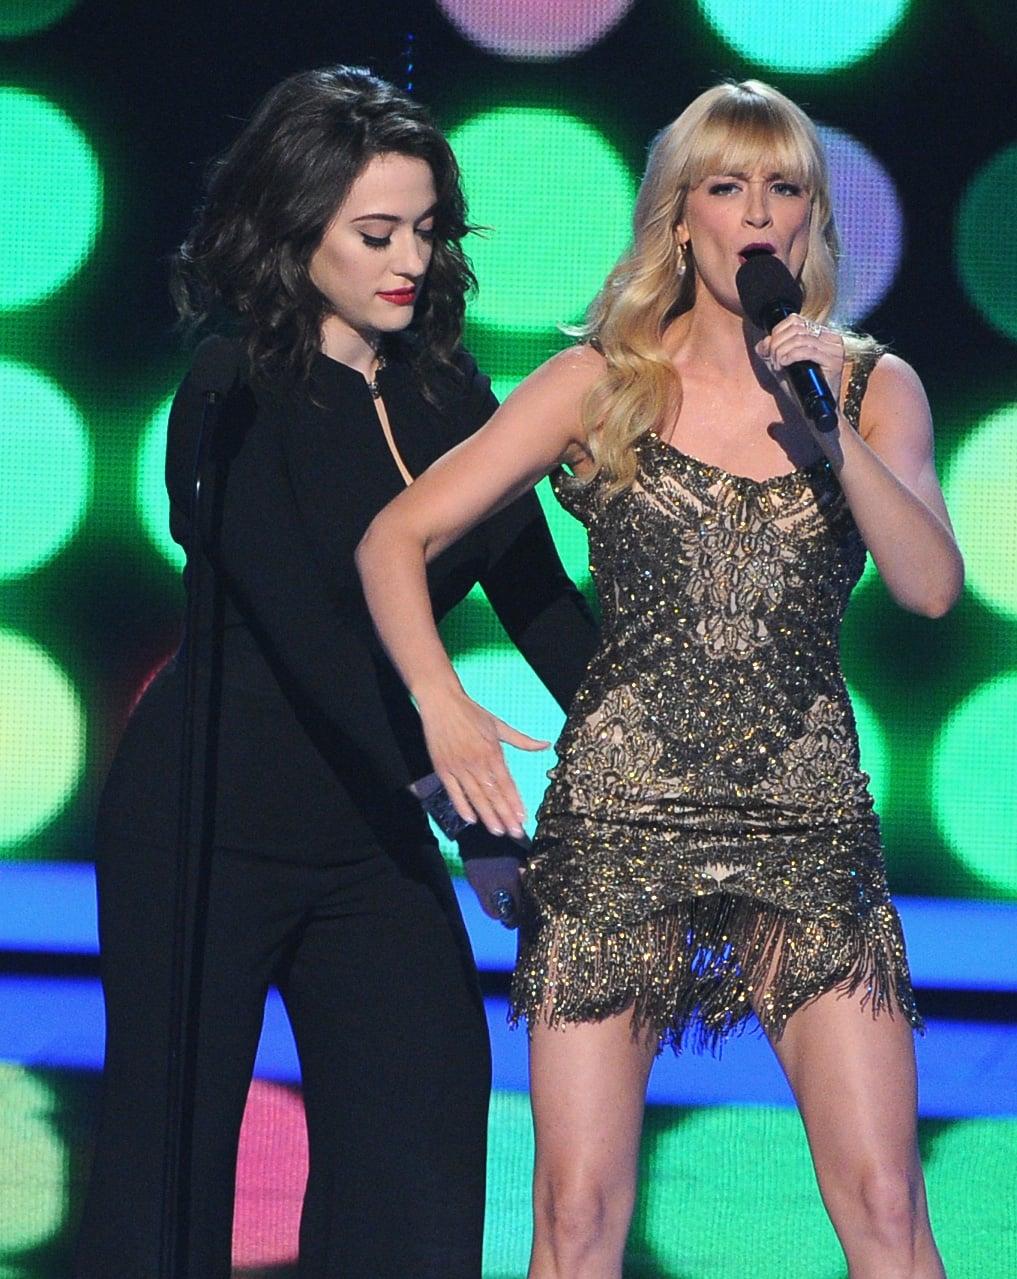 Kat helped adjust Beth's dress.